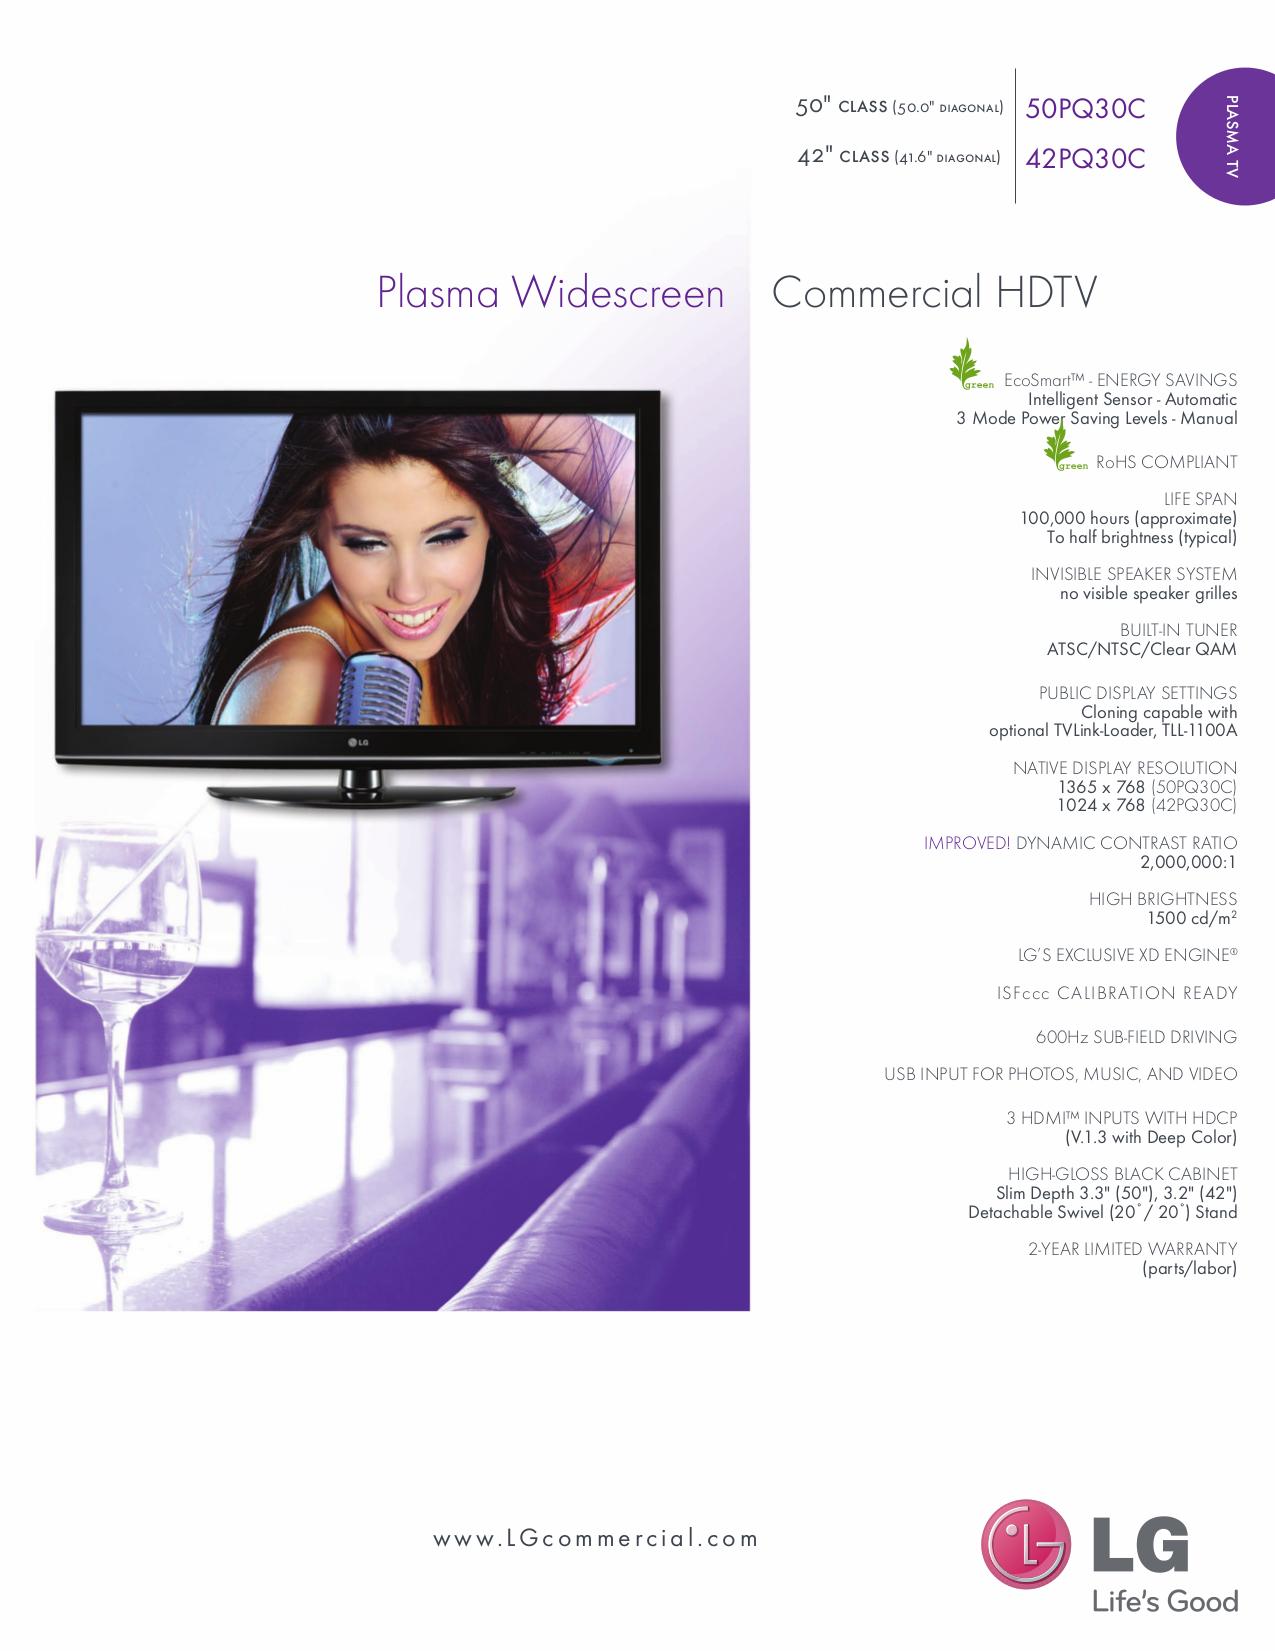 pdf for LG TV 50PQ30C manual